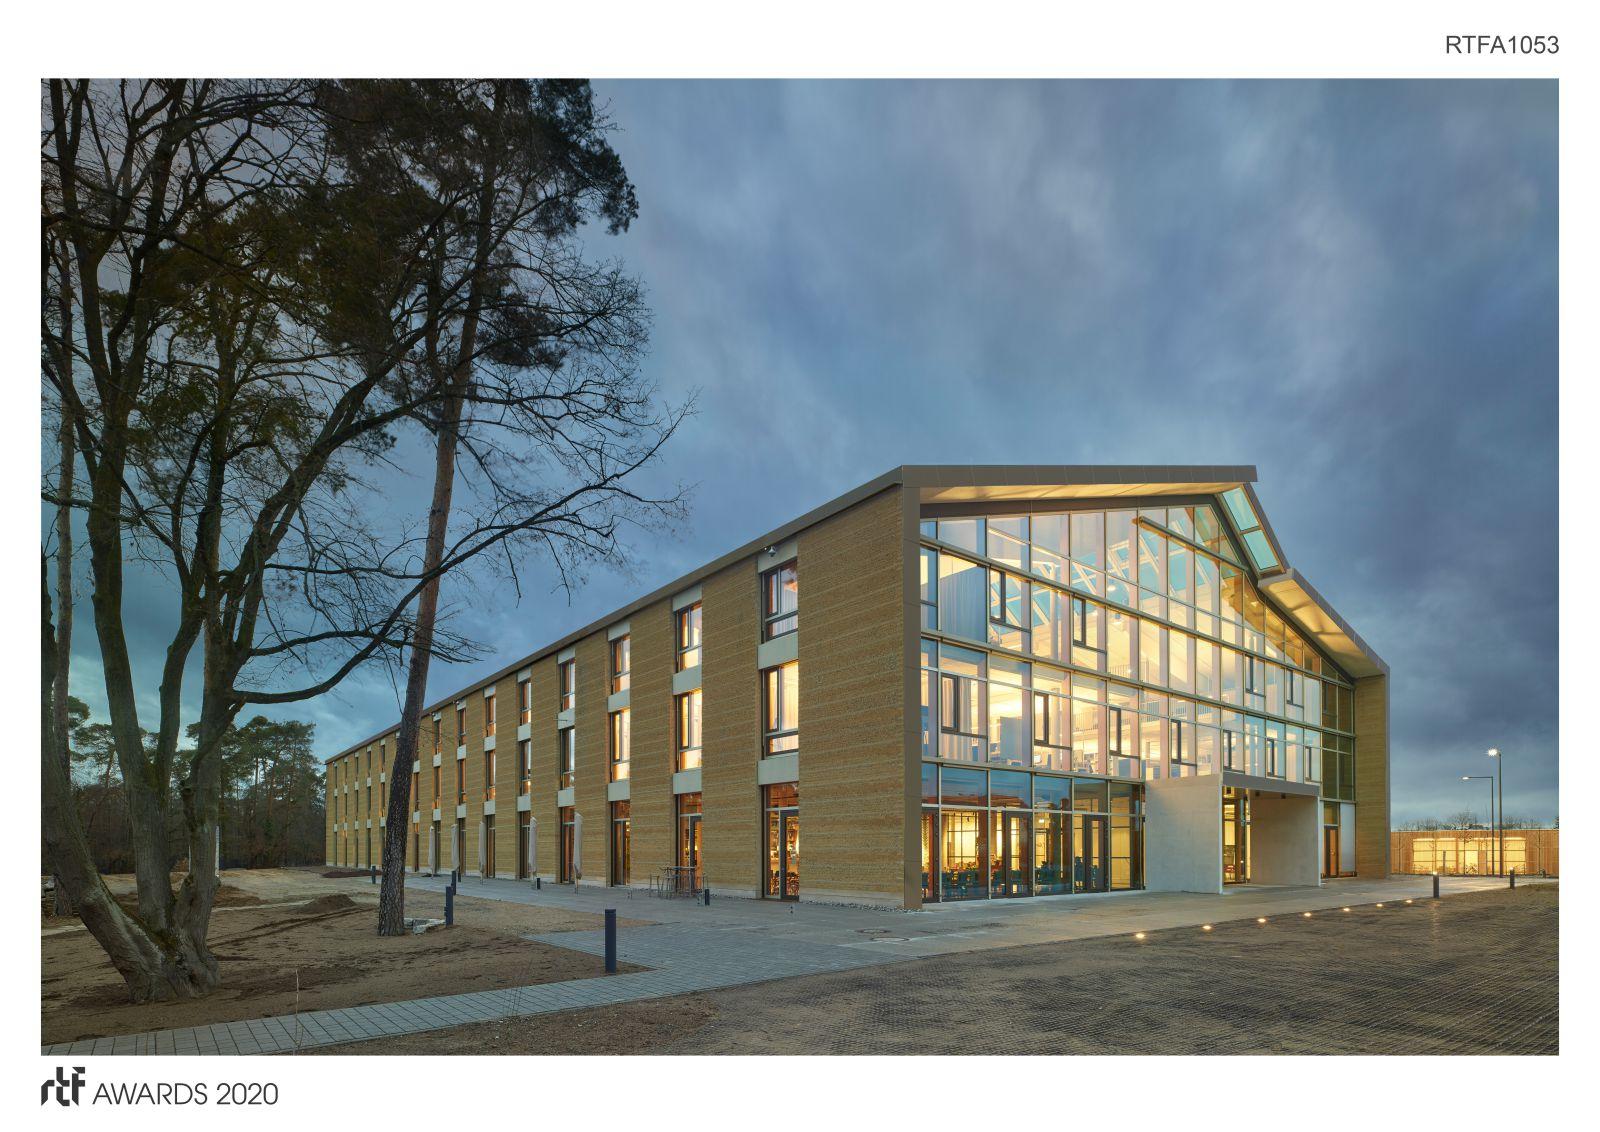 RTF 2020 Architectural Category